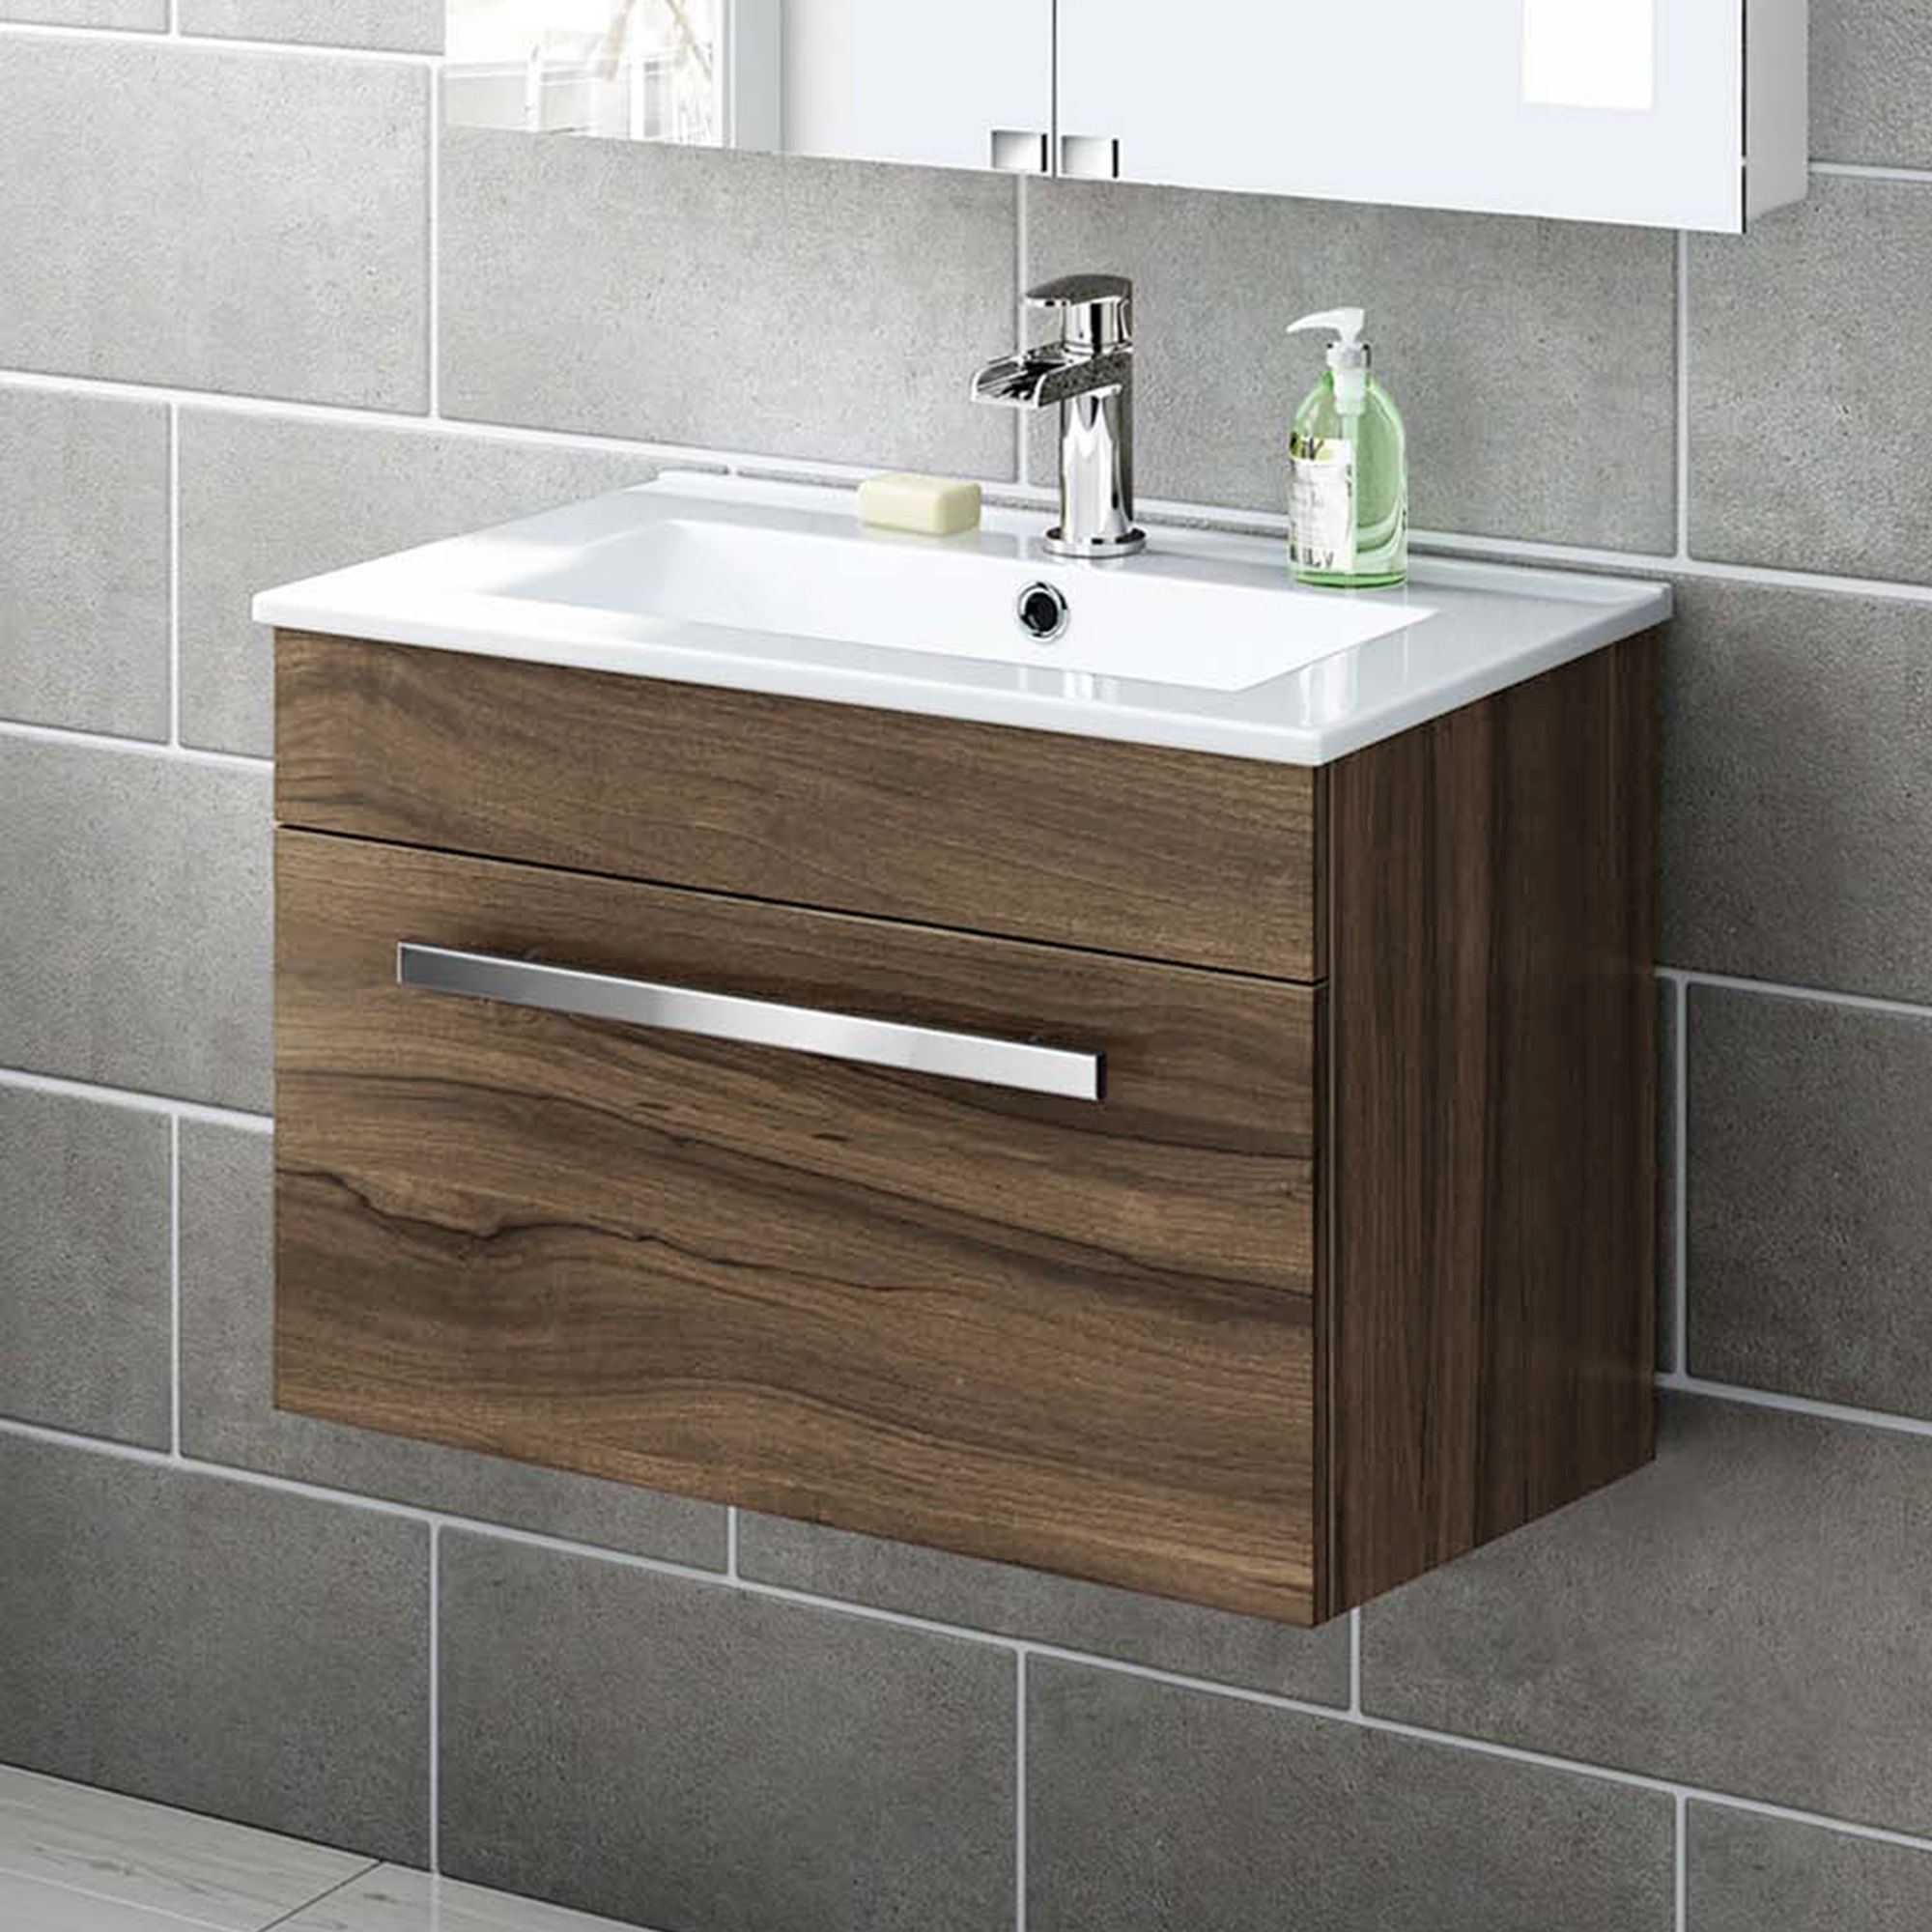 600mm Avon Walnut Effect Basin Cabinet Wall Hung Bathroom Basin Cabinet Wash Basin Cabinet Basin Cabinet